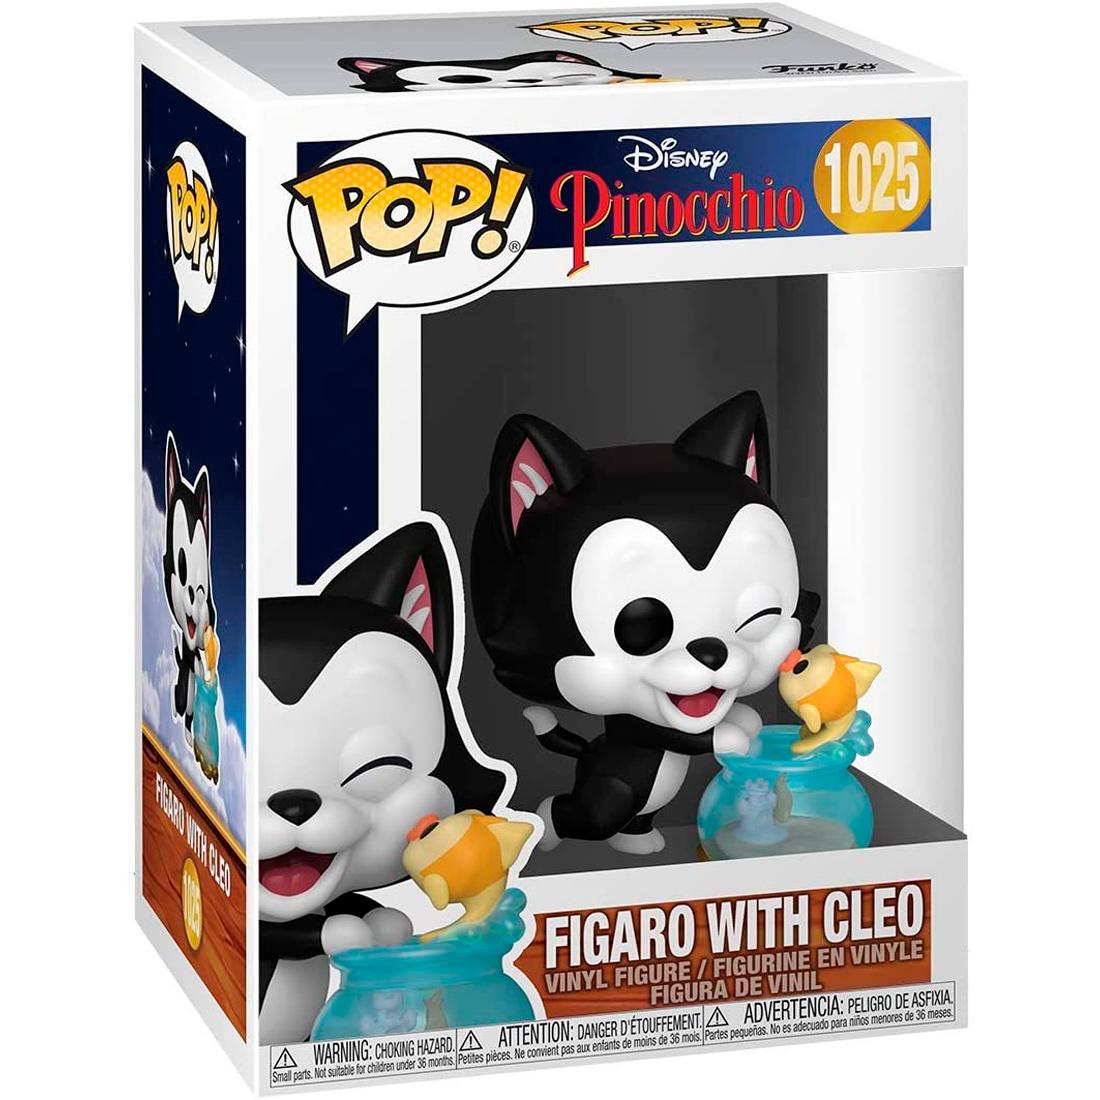 Funko Pop Disney Pinocchio 1025 Figaro With Cleo